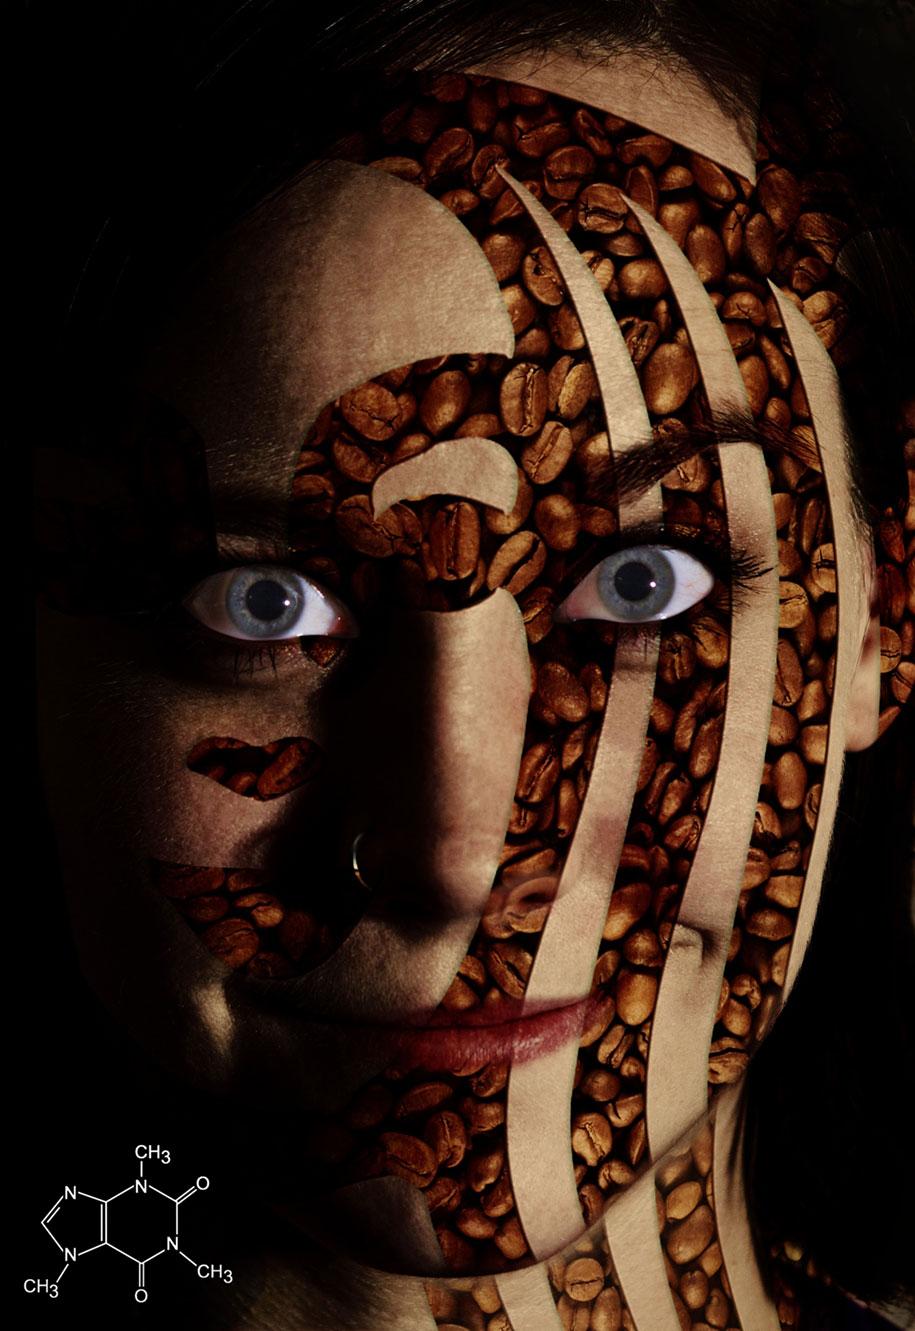 people-using-drugs-portraits-inebrination-les-baker-v-5